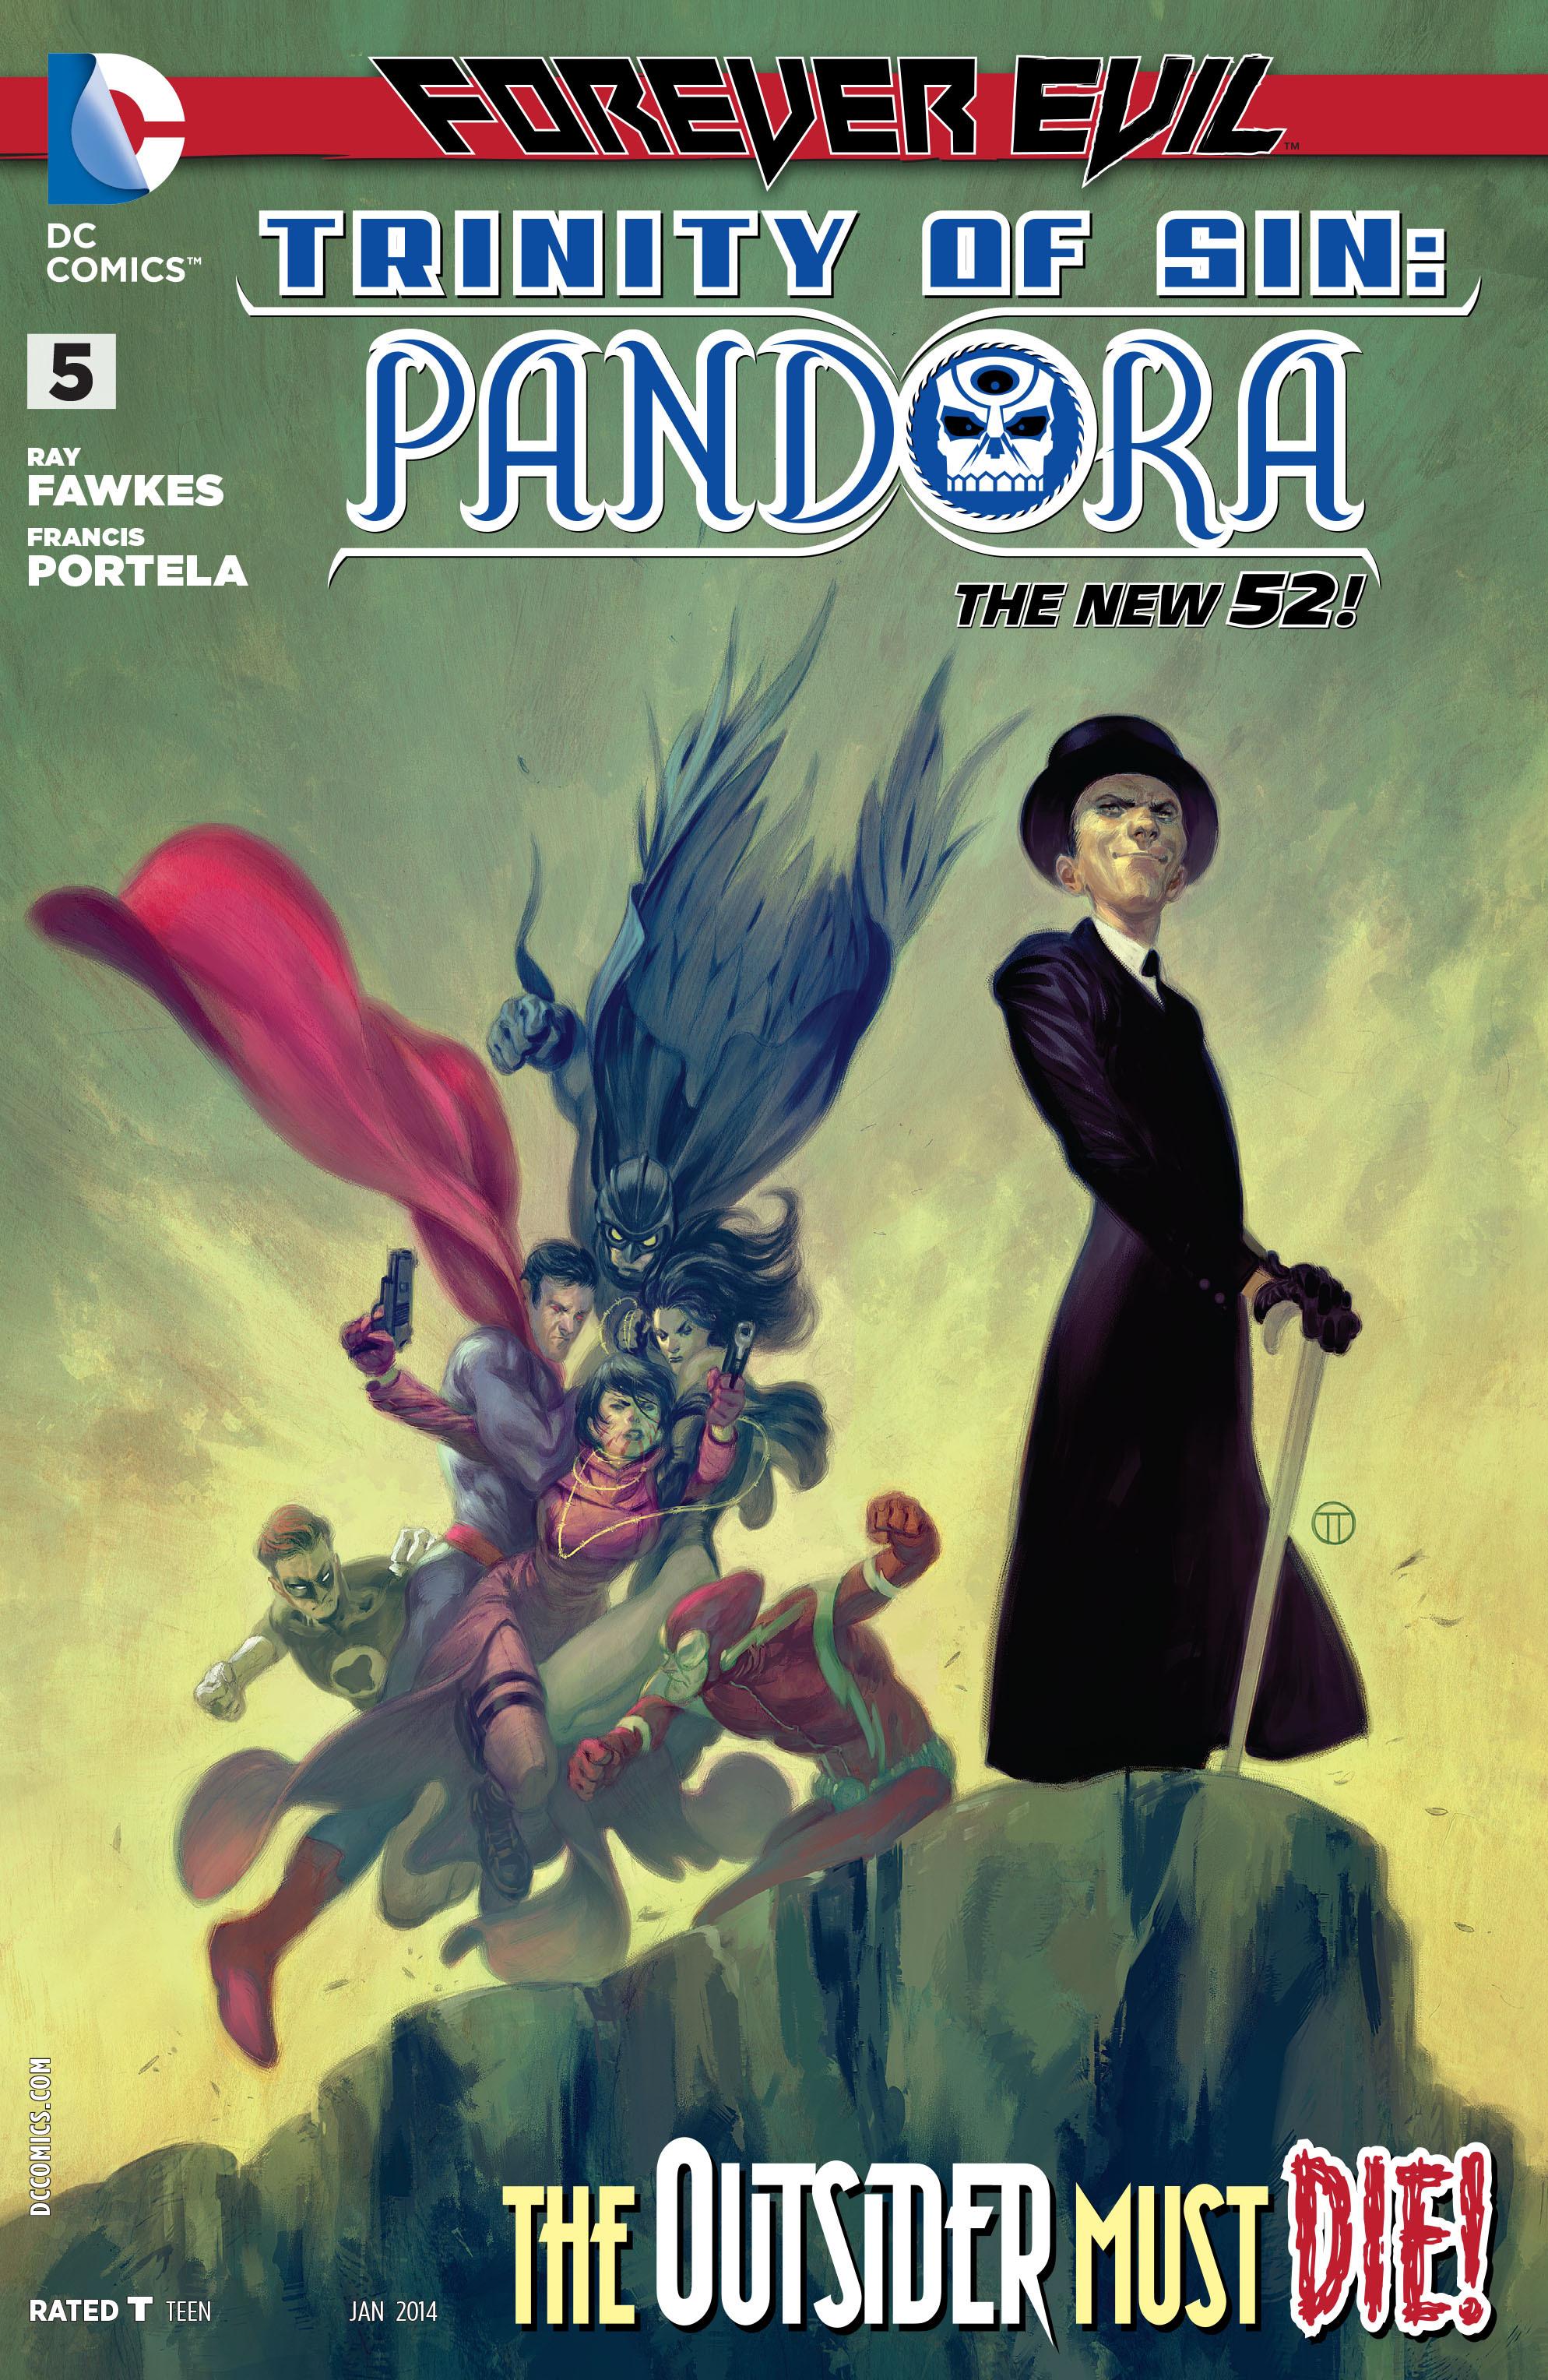 Read online Trinity of Sin: Pandora comic -  Issue #5 - 1